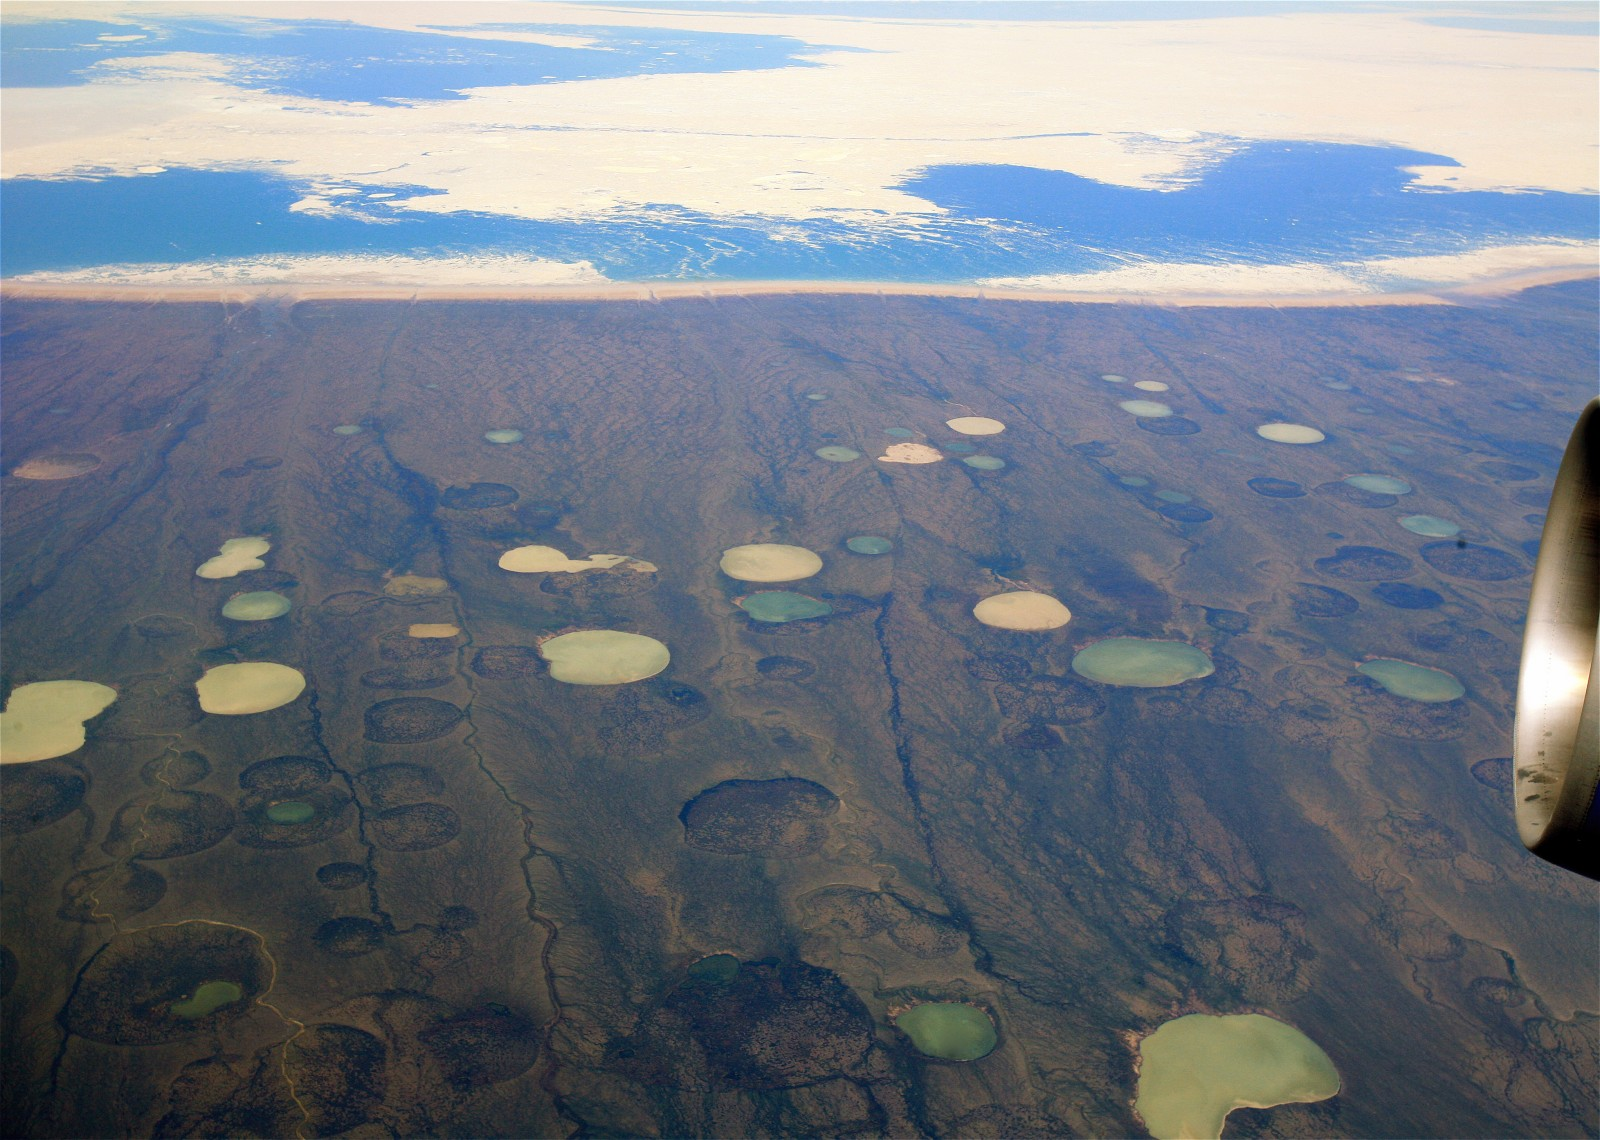 Figure 2: Permafrost thaw ponds in Hudson Bay Canada (taken from Wikimedia )